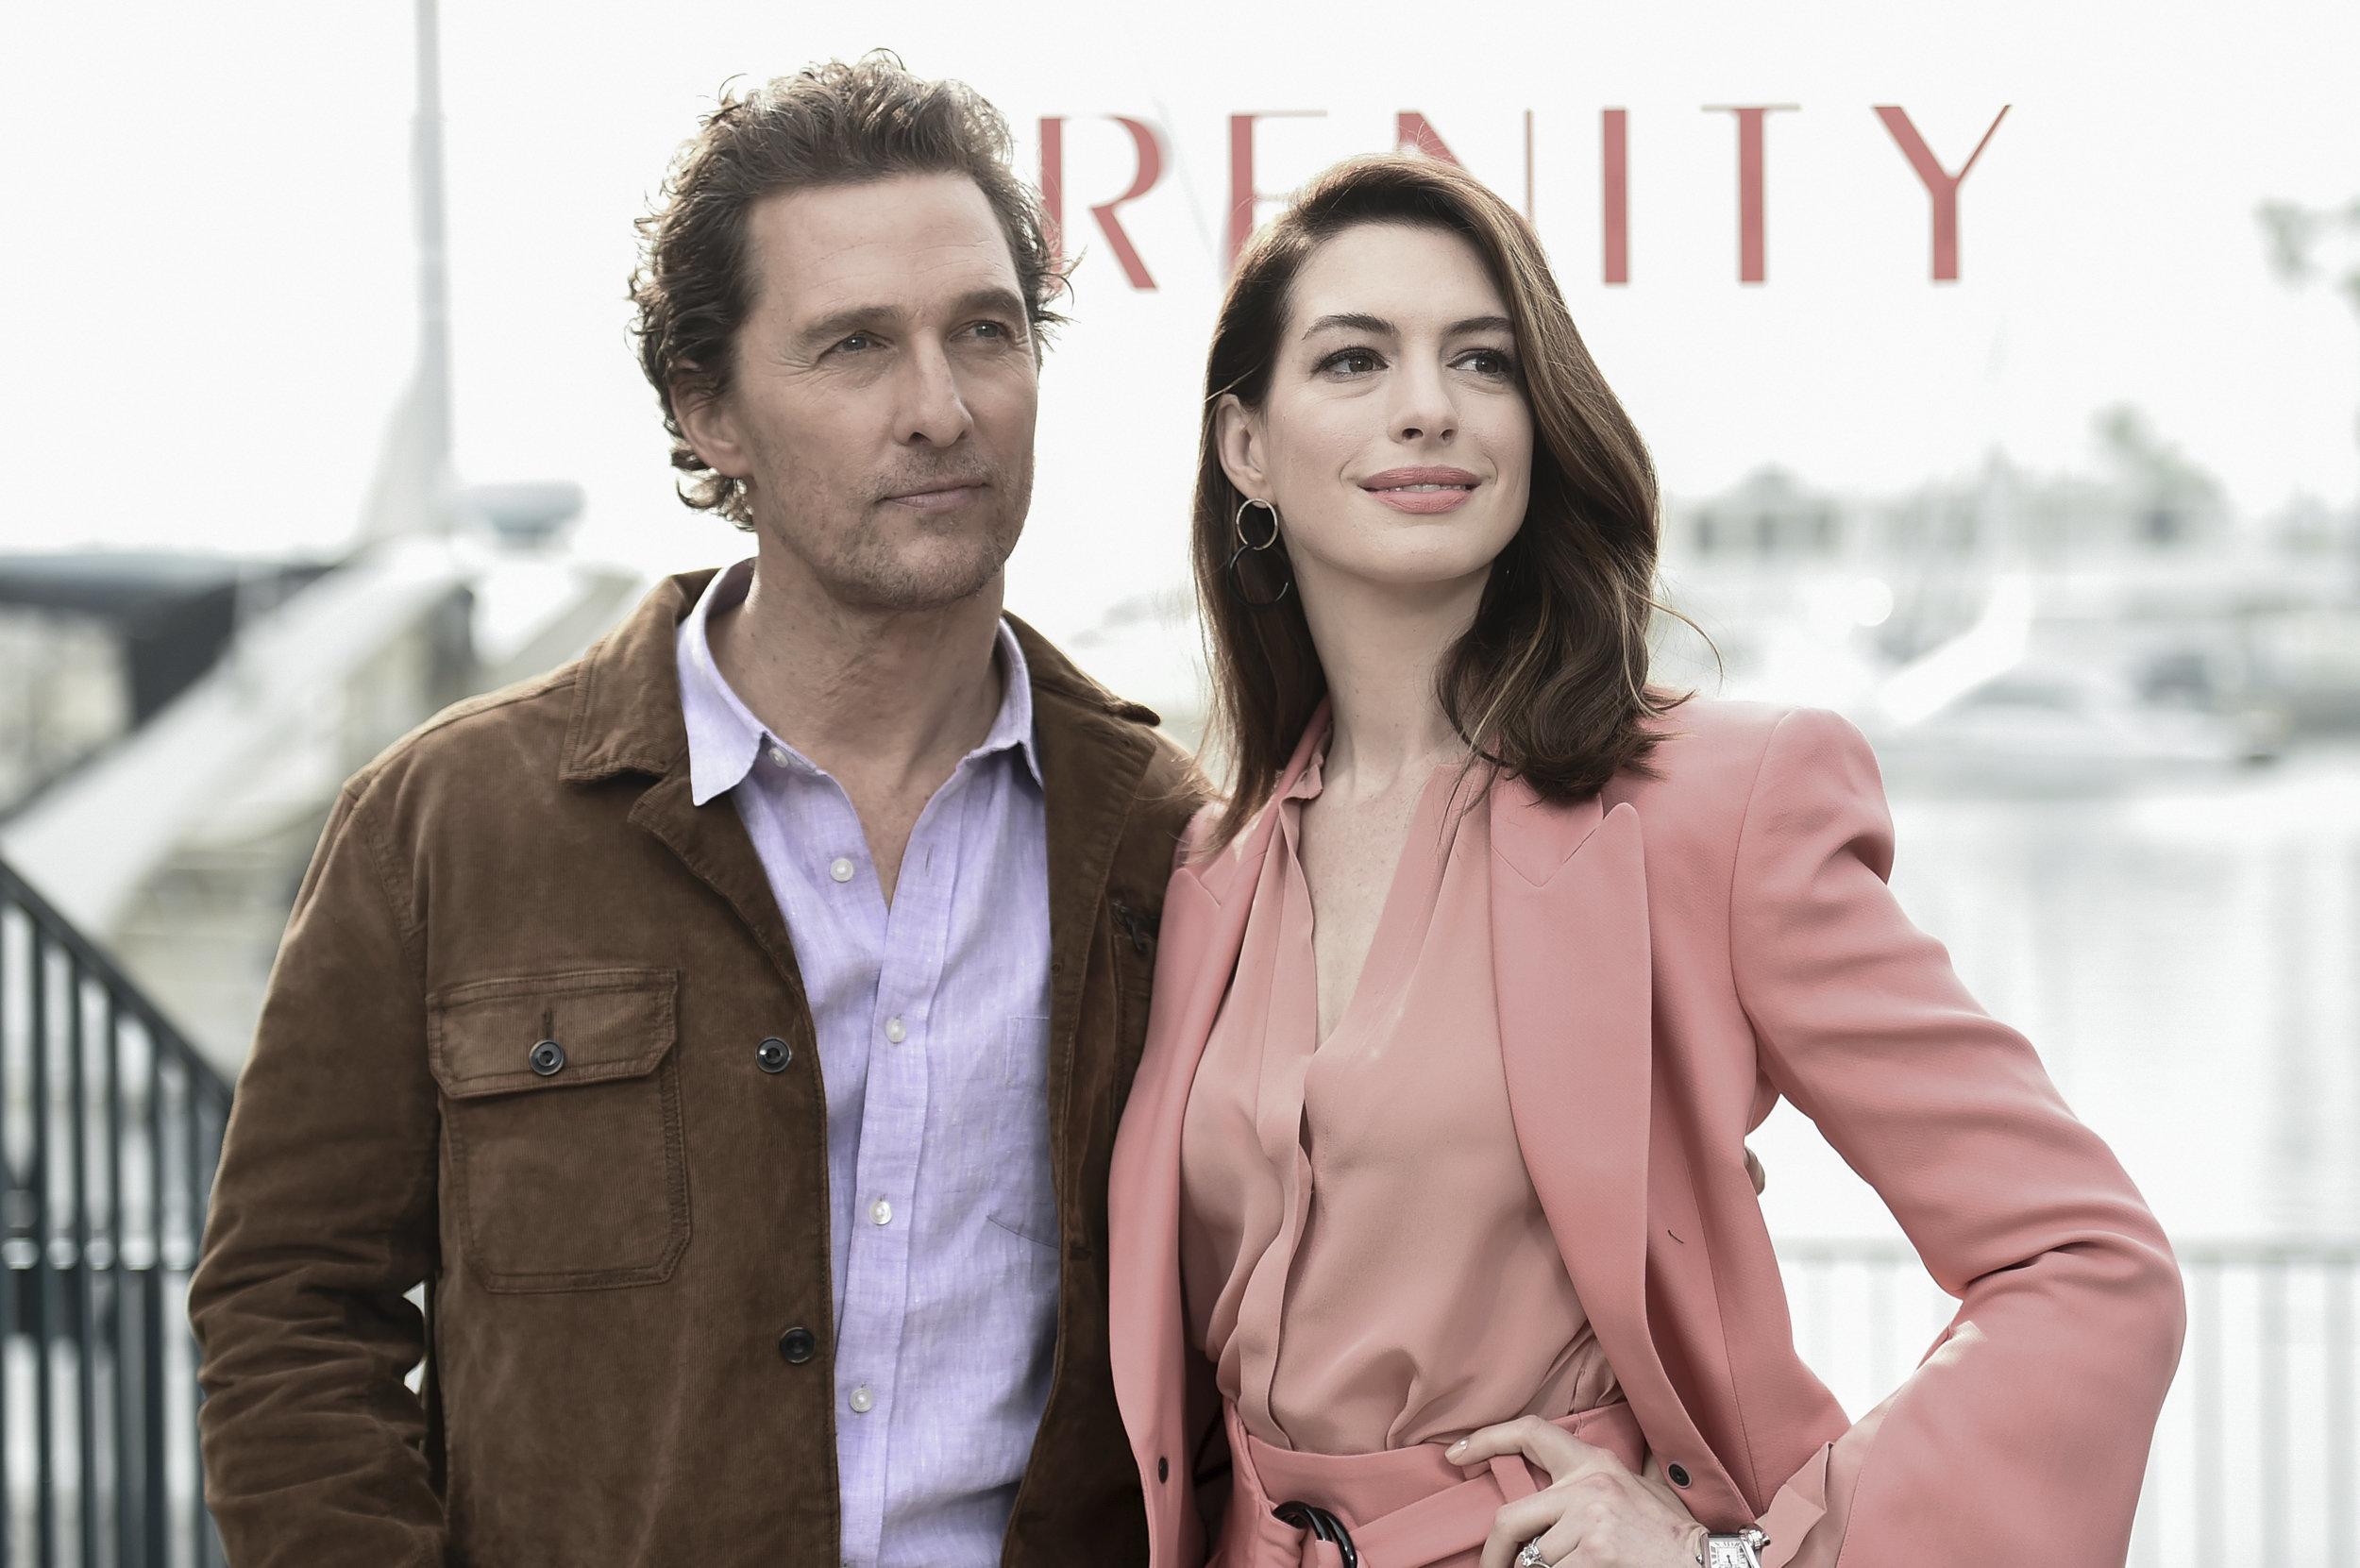 WATCH: Matthew McConaughey & Anne Hathaway Talk